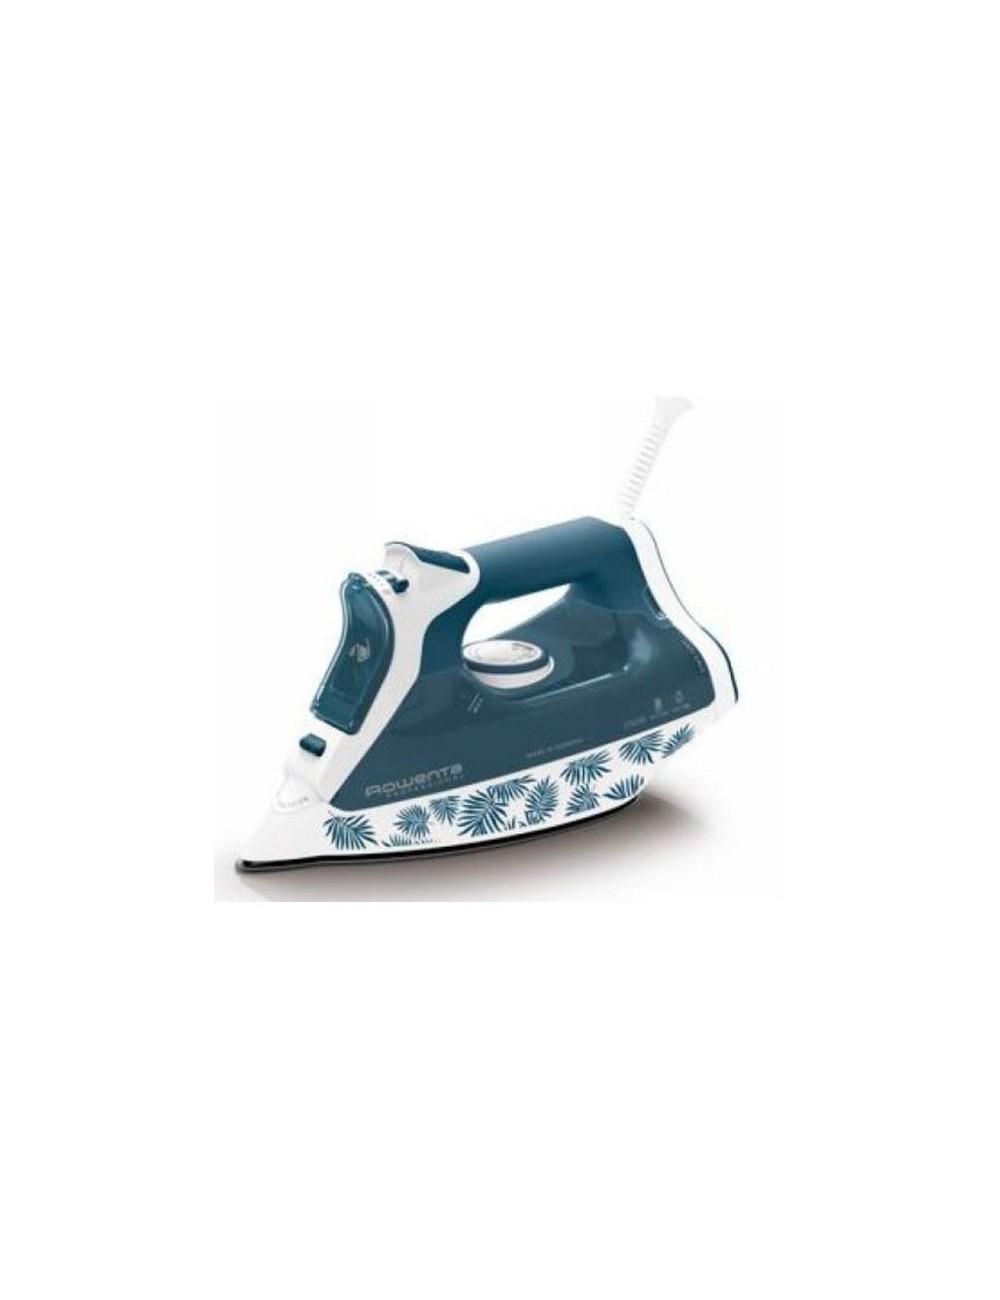 Plancha Vapor Rowenta DW8023 Pro Master 2700W Blu Jungle